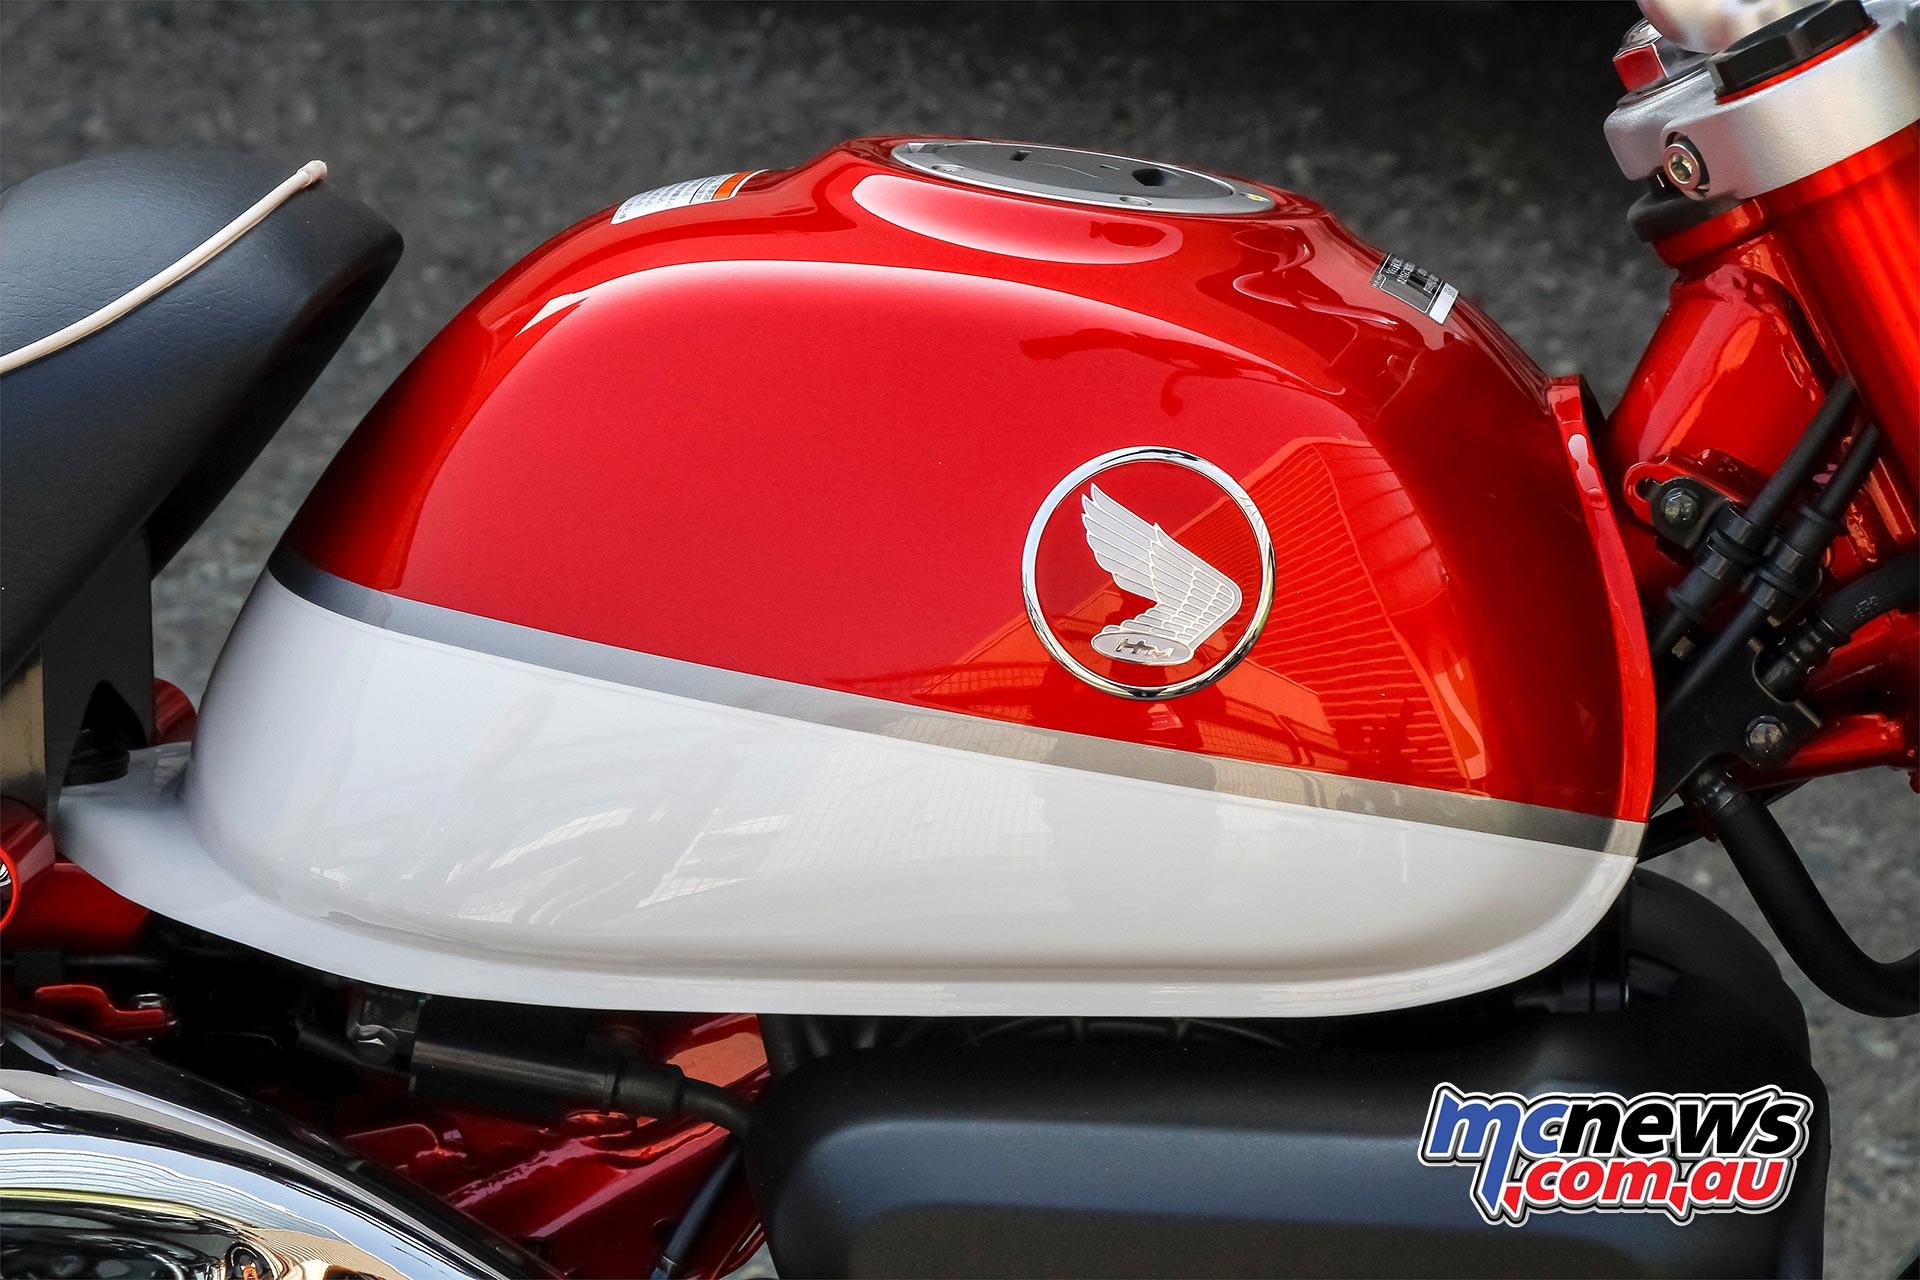 Honda Virginia Beach >> New 125cc Honda Monkey here in July at $5999 | MCNews.com.au